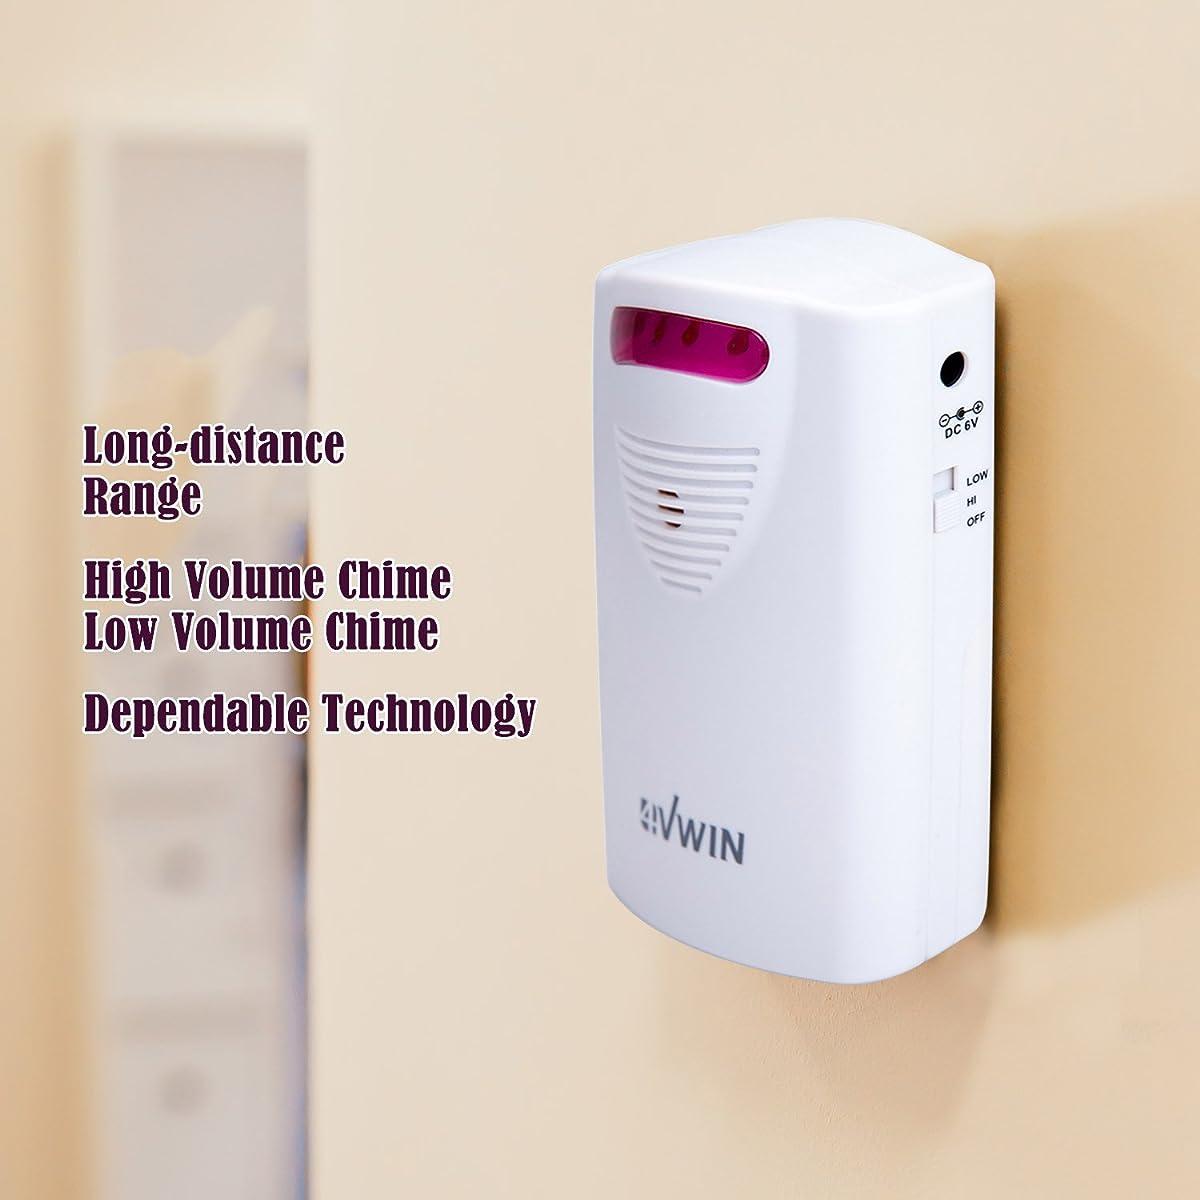 4VWIN Home Security Driveway Alarm 1 Receiver and 2 PIR Motion Sensor Detector Alert System Kit